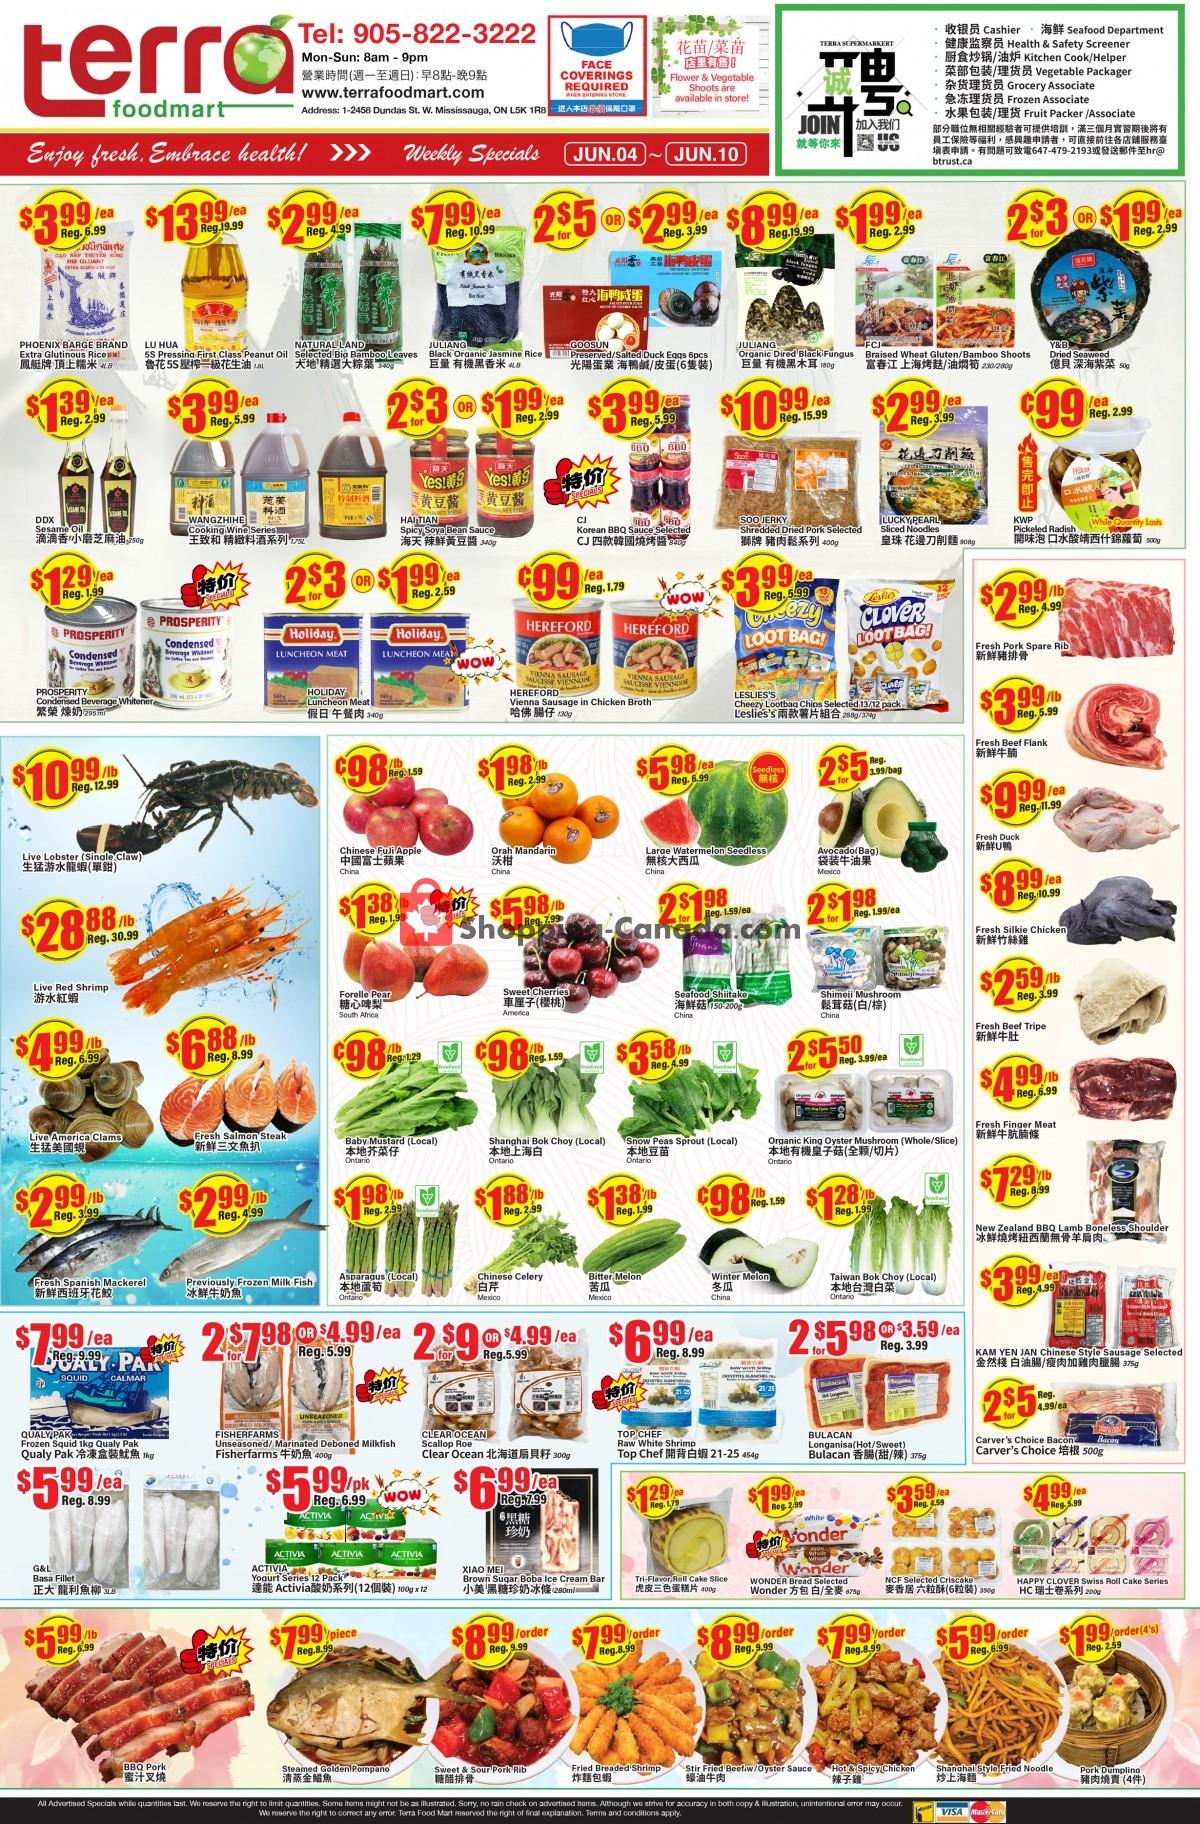 Flyer Terra Foodmart Canada - from Friday June 4, 2021 to Thursday June 10, 2021